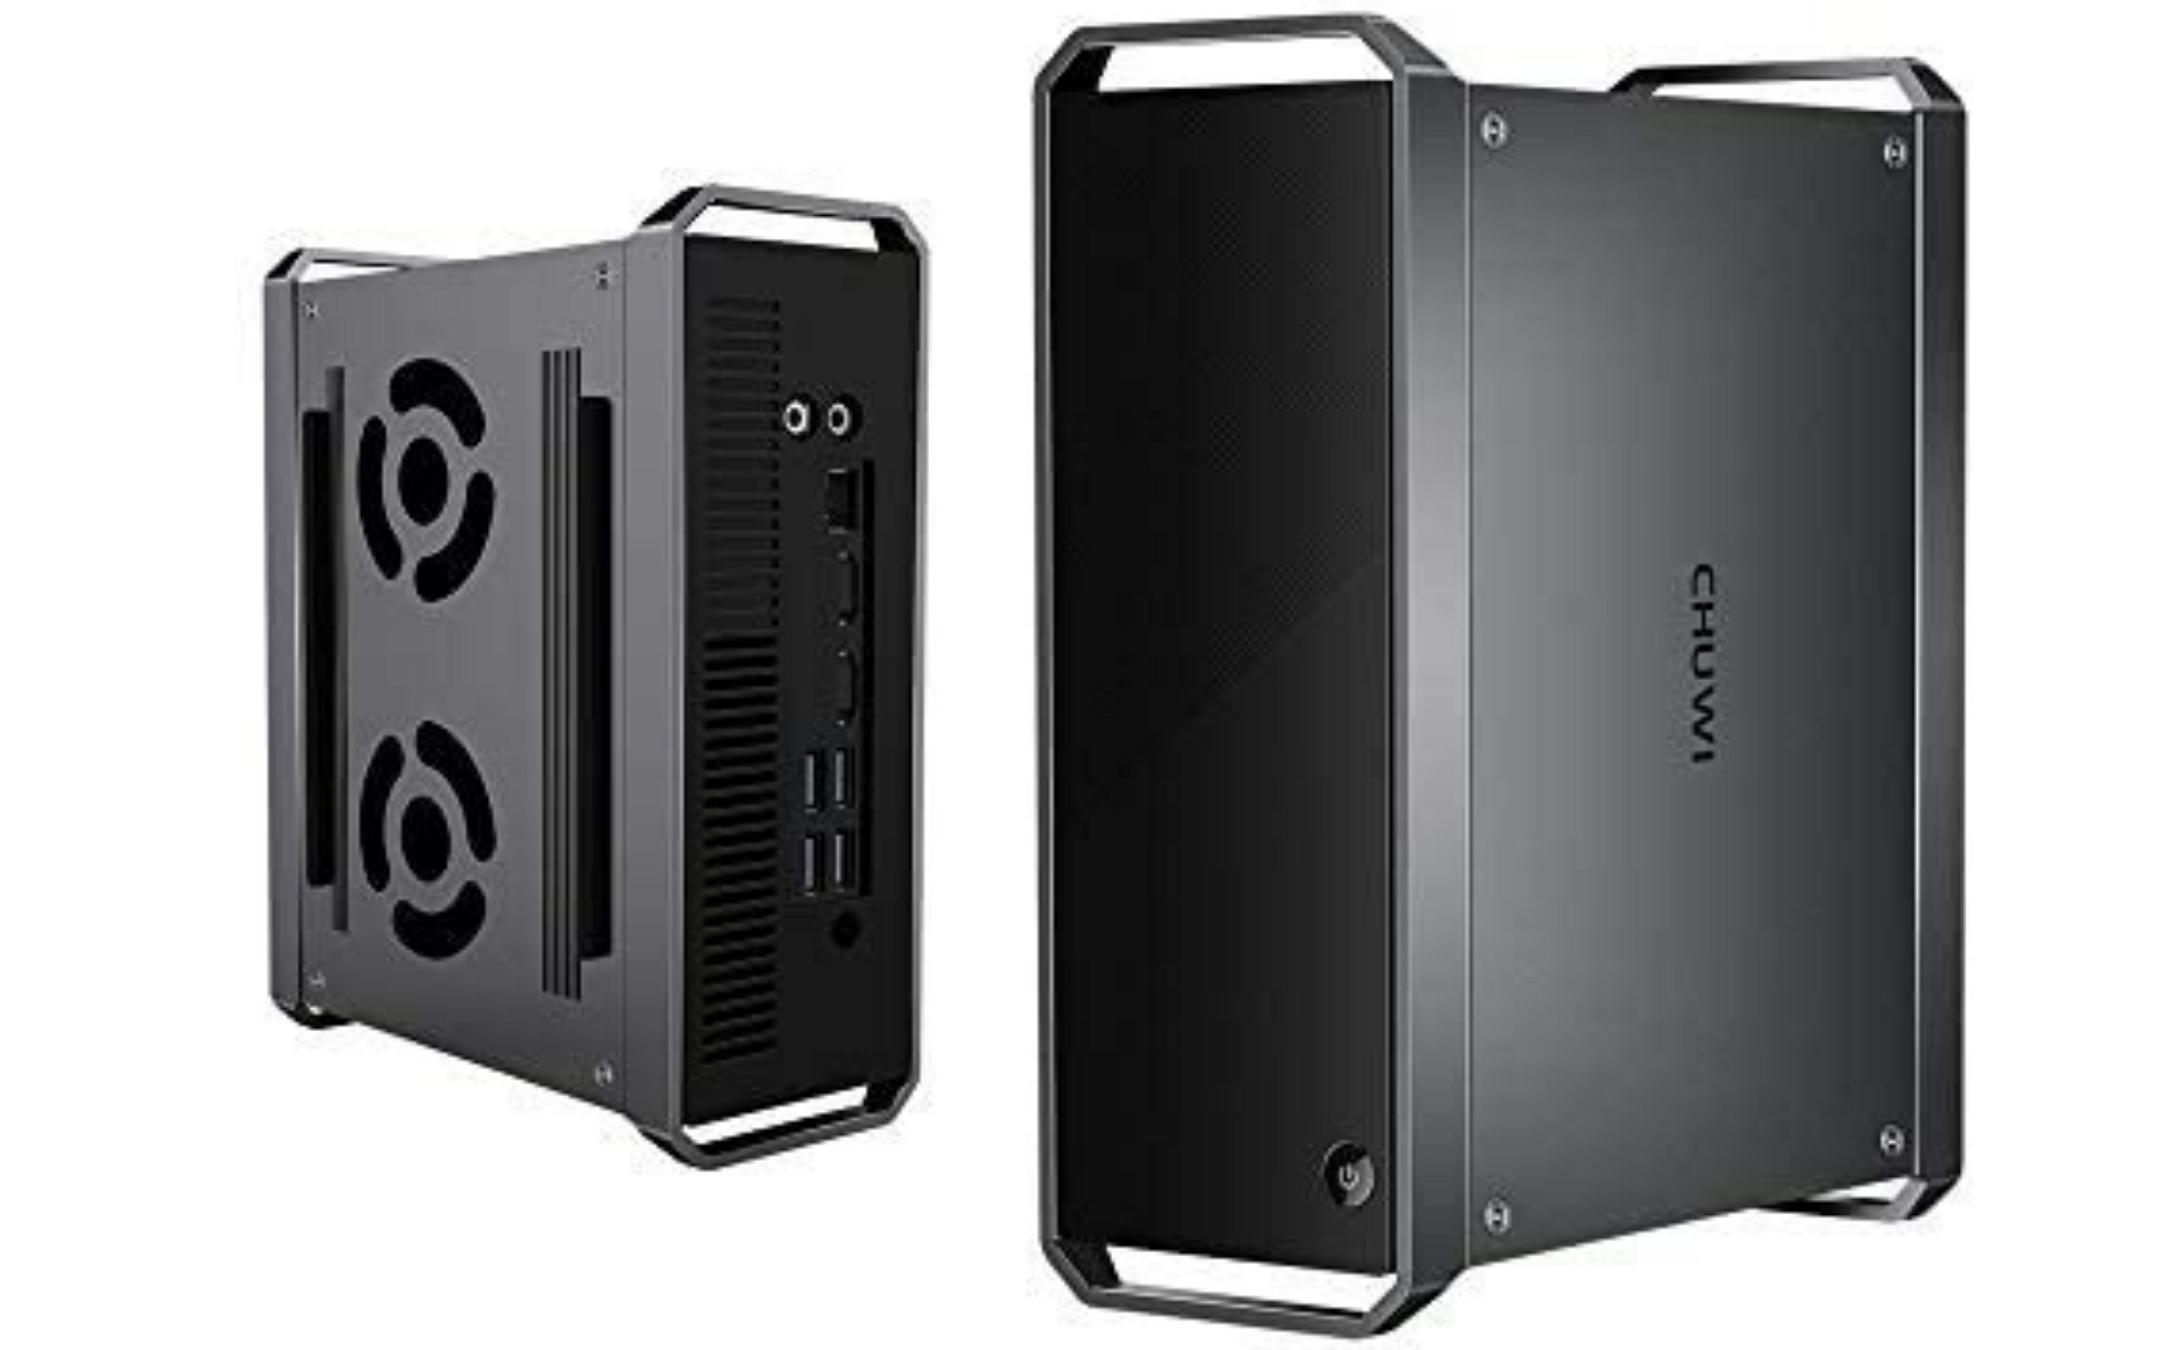 Chuwi CoreBox: the high-end Mini PC on offer